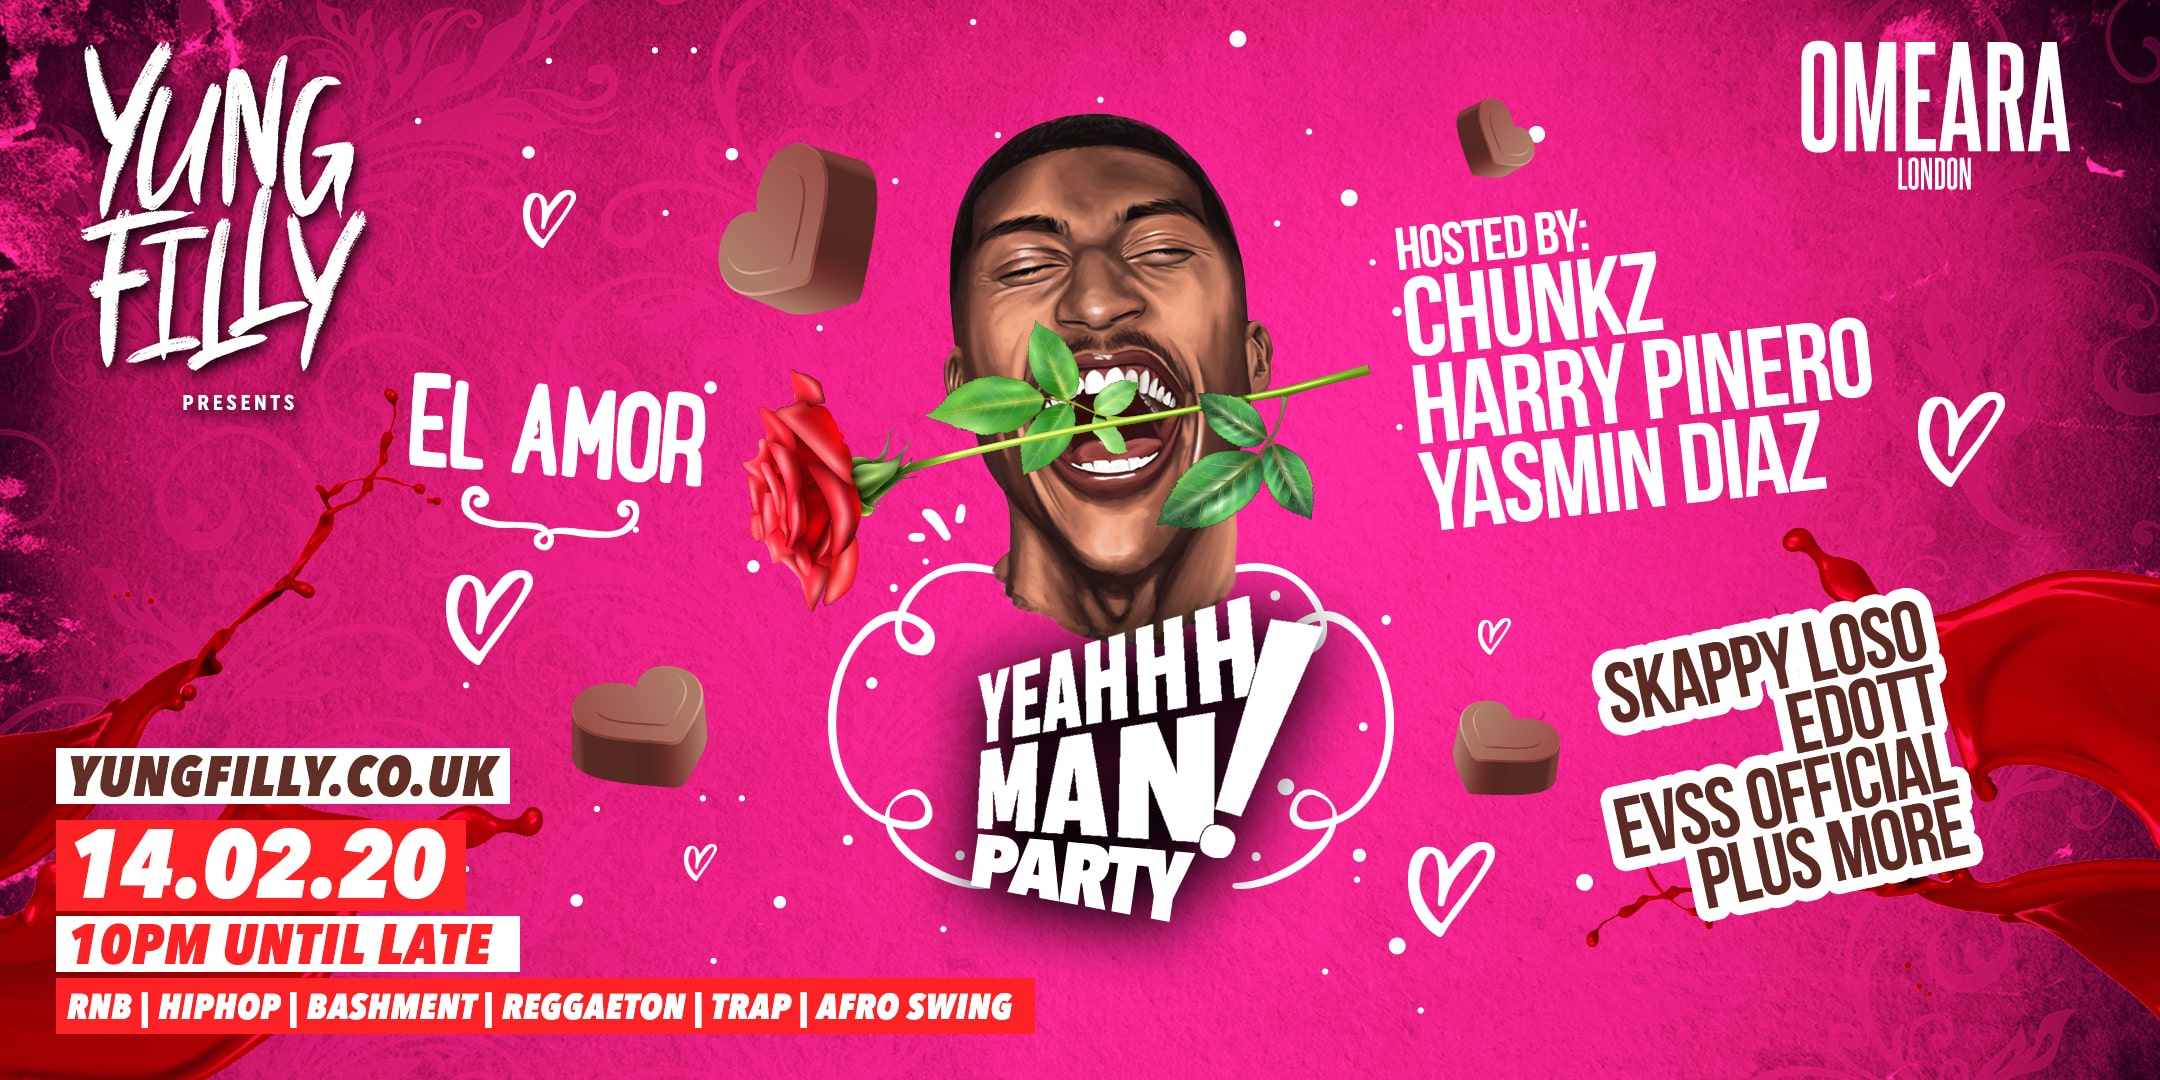 Yung Filly Presents: YeahhhMan – El Amor Valentines Special